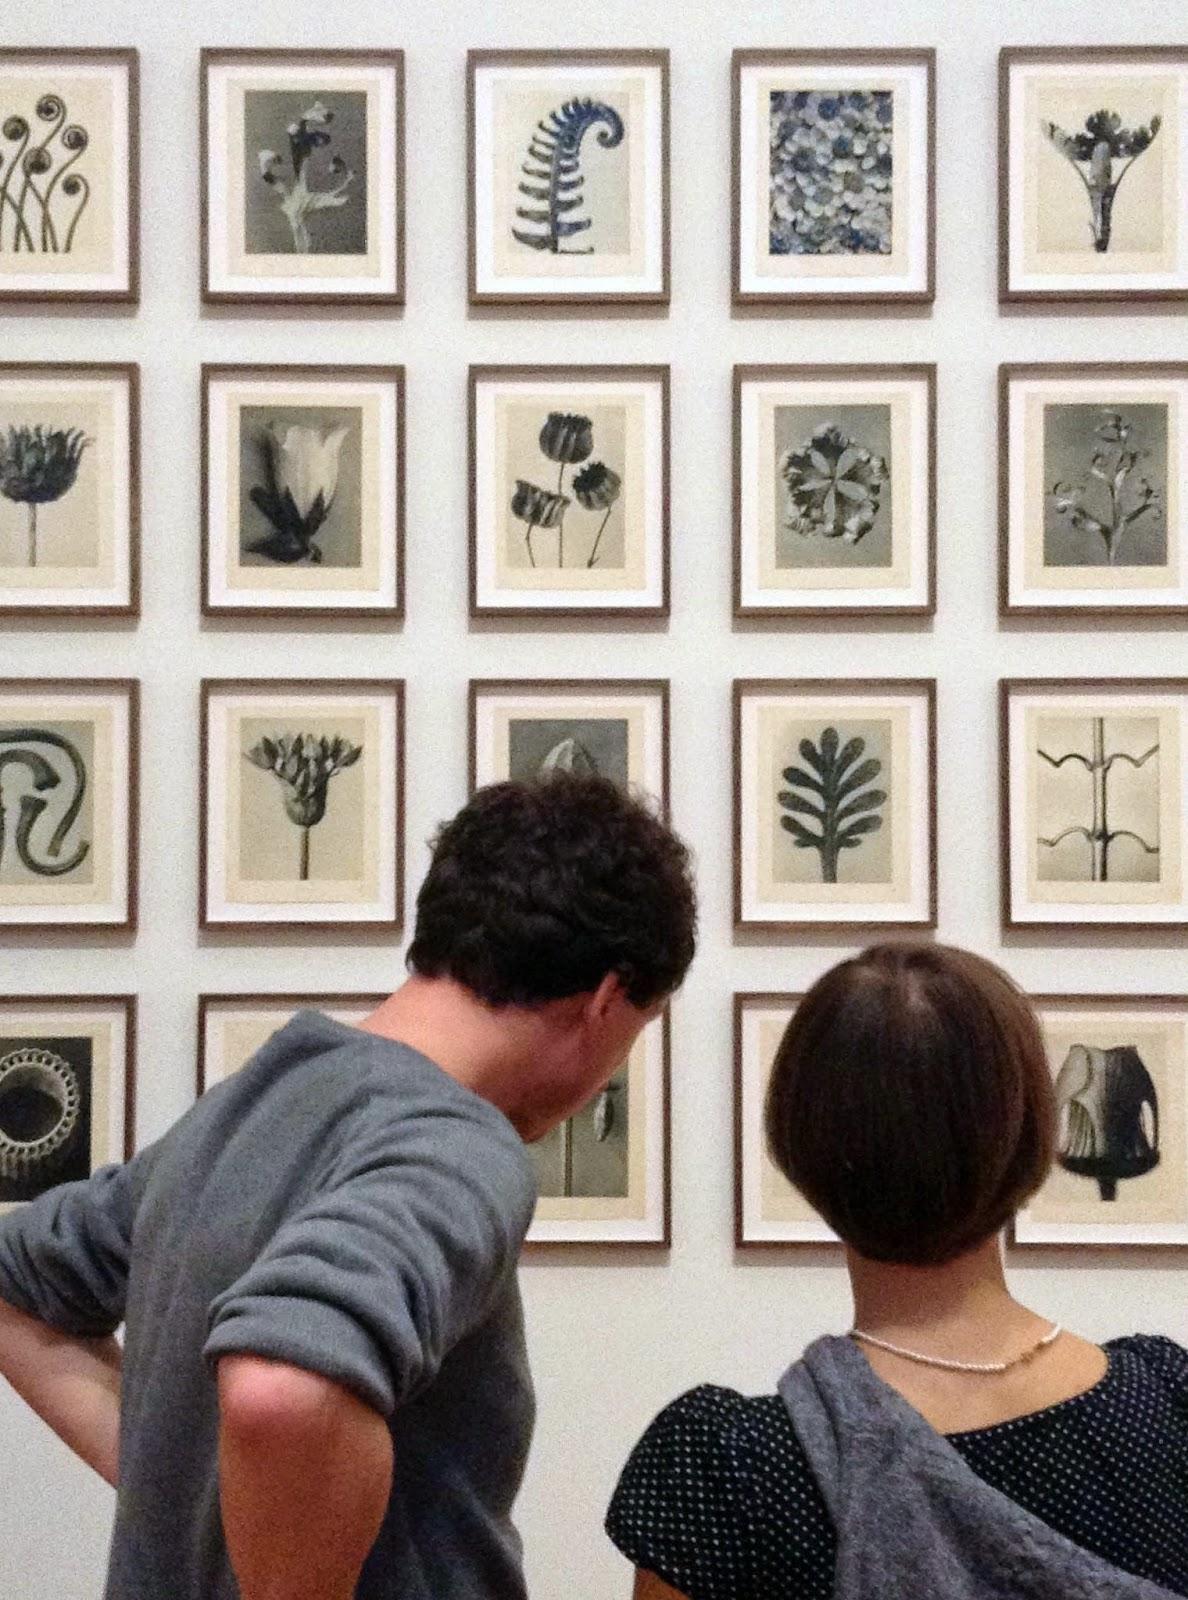 36 plant studies, Karl Blossfeldt